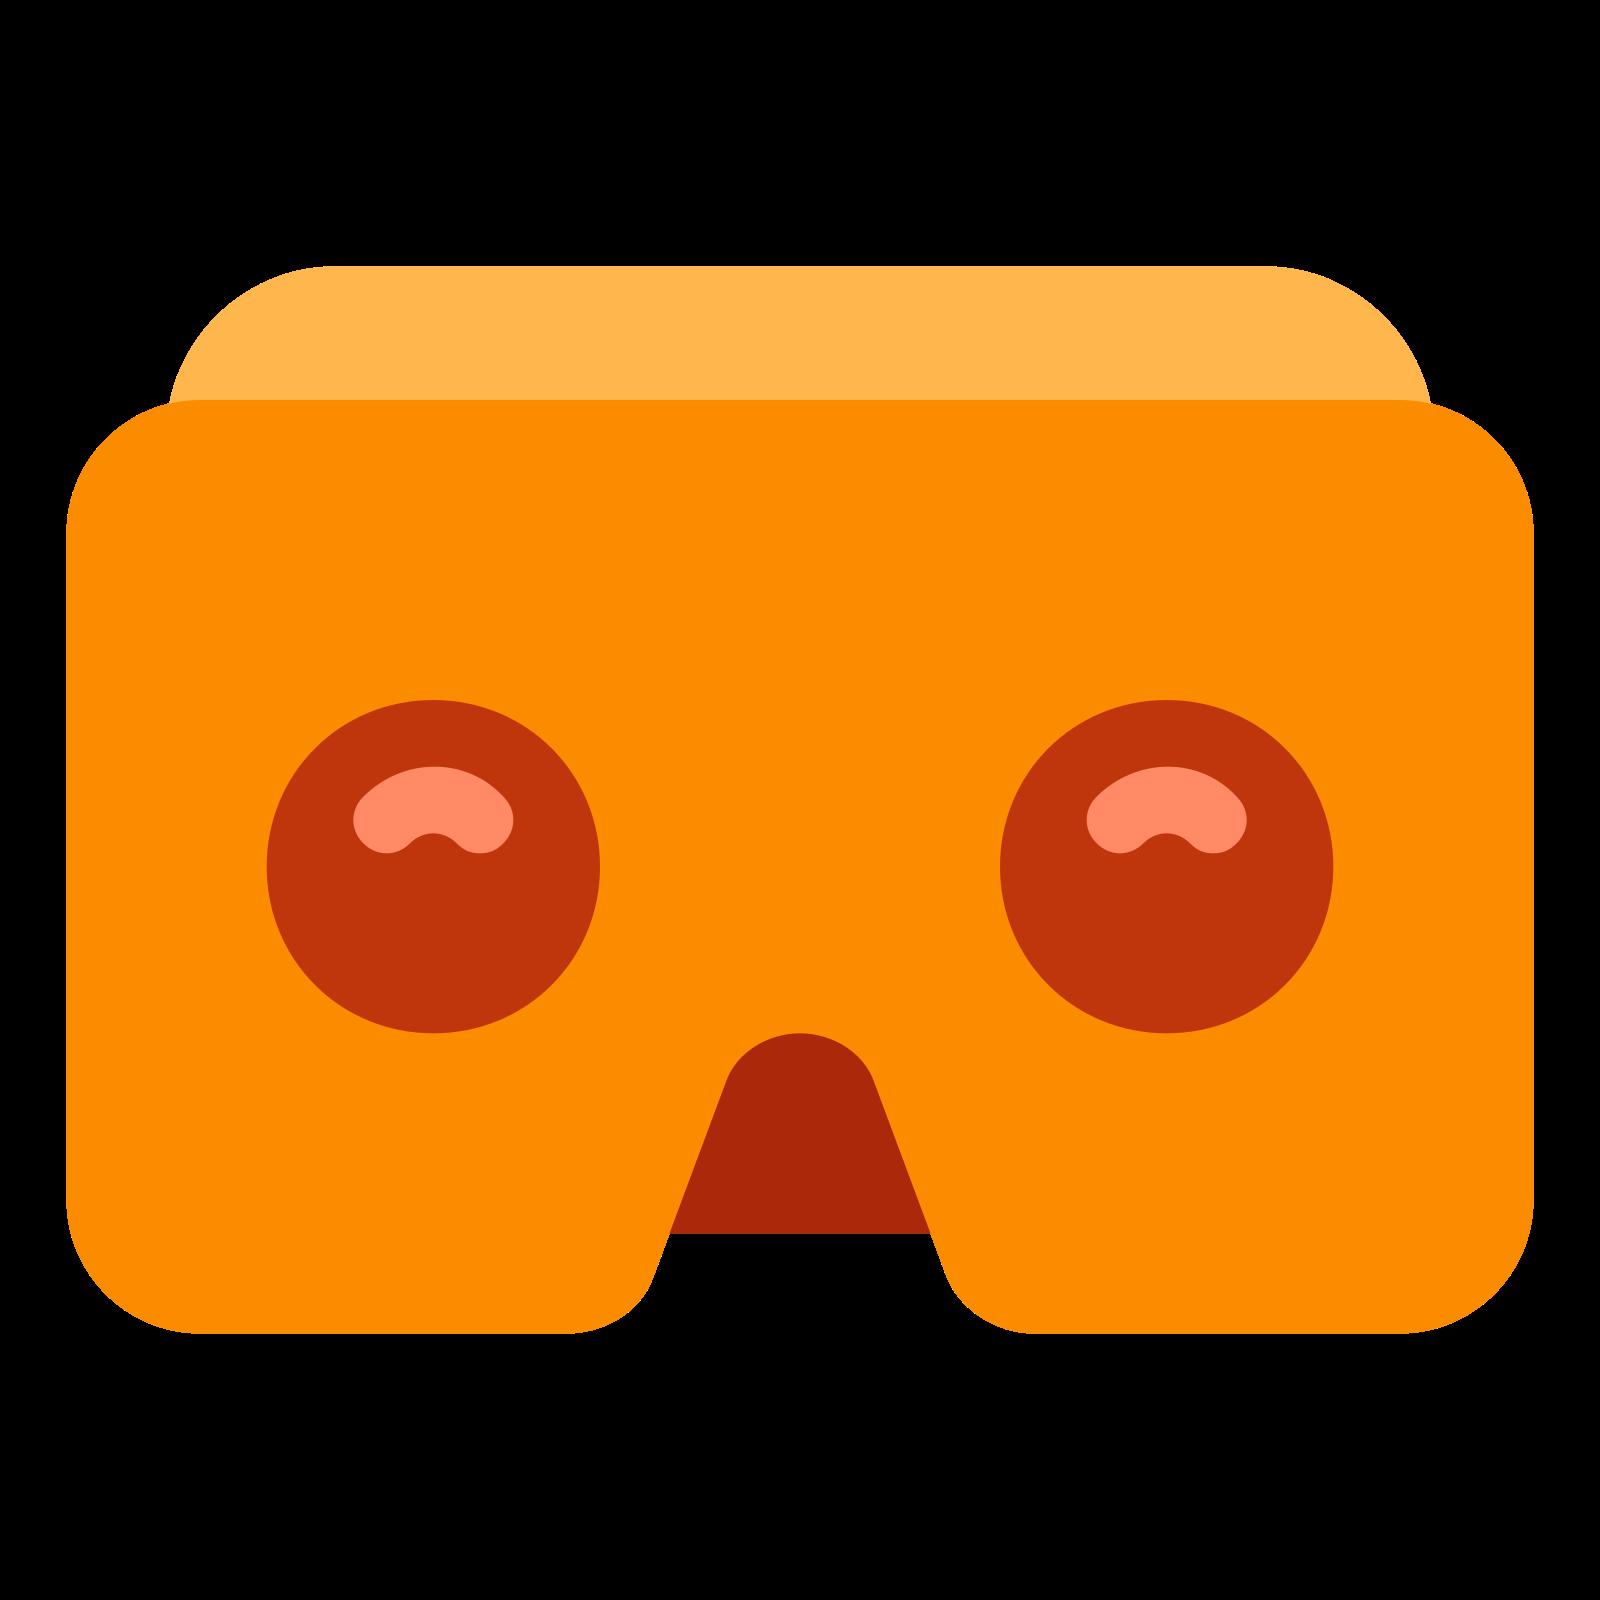 Виртуальная реальность icon